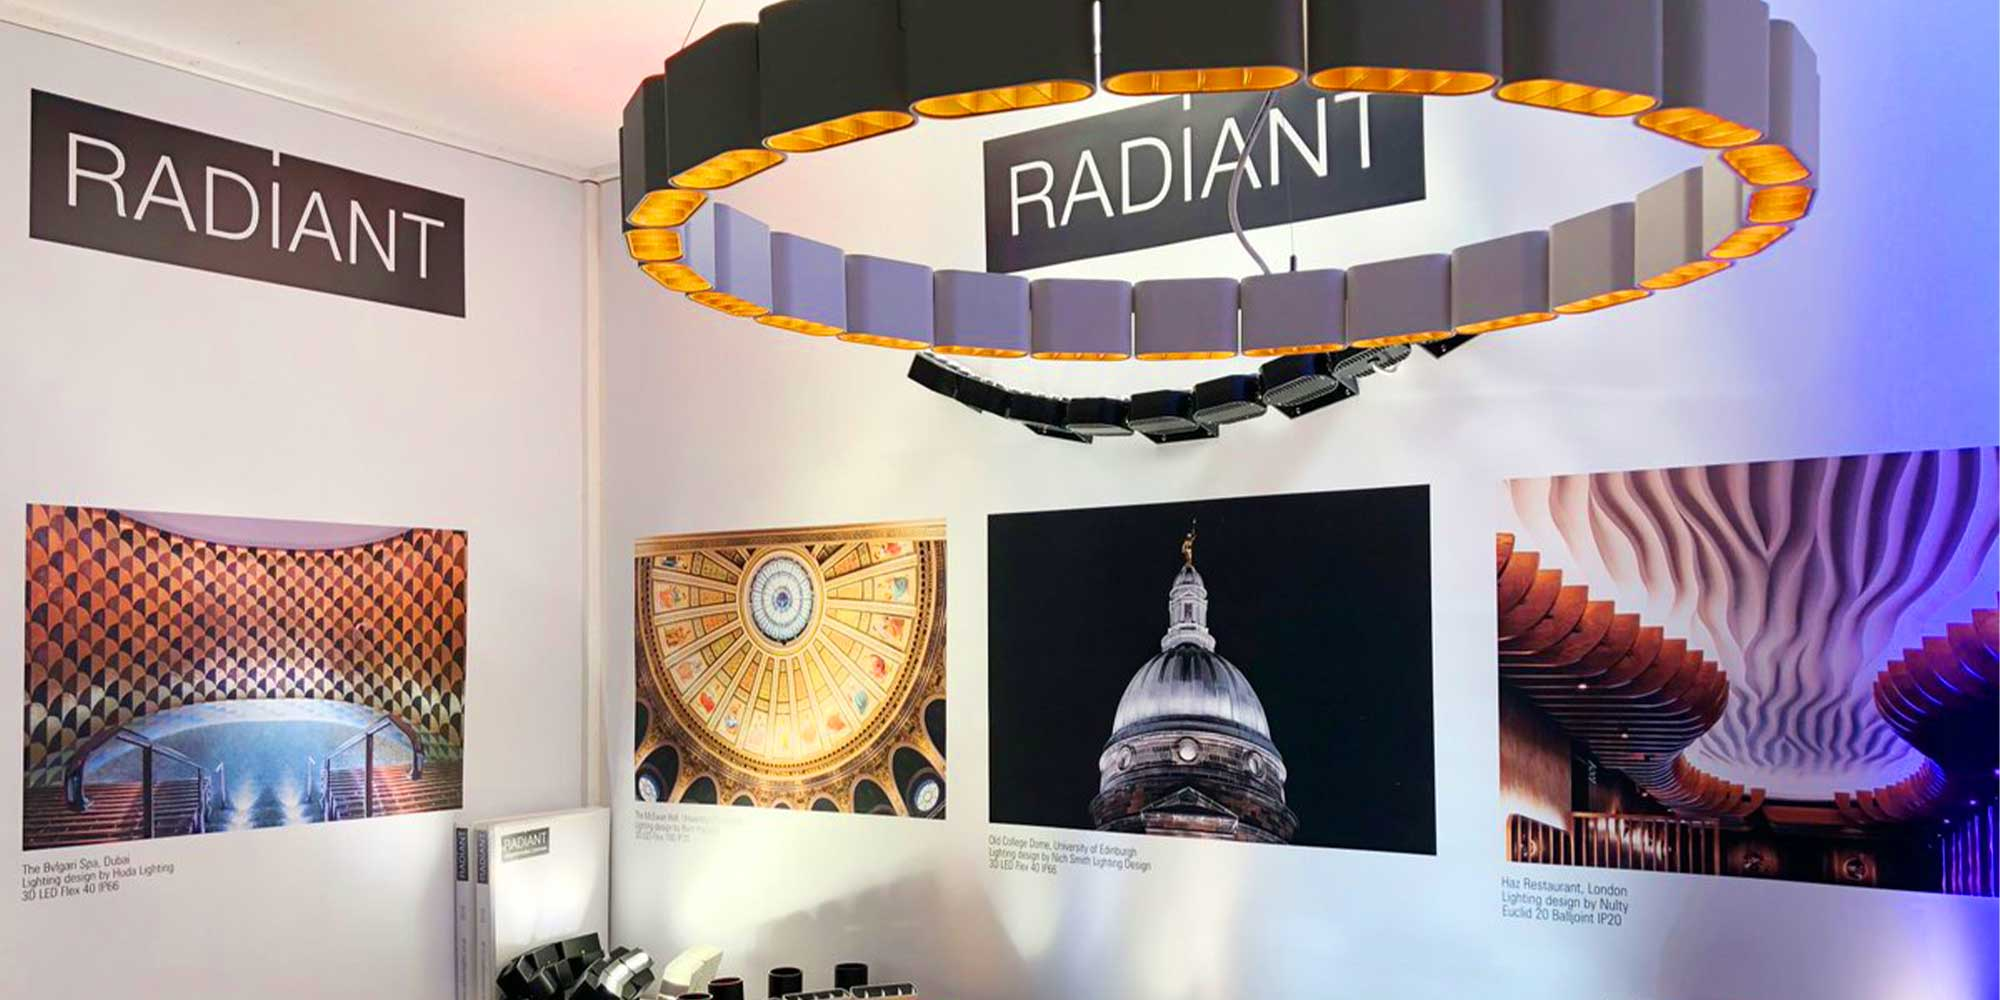 Radiant | Architectural Lighting | Enlighten Ireland